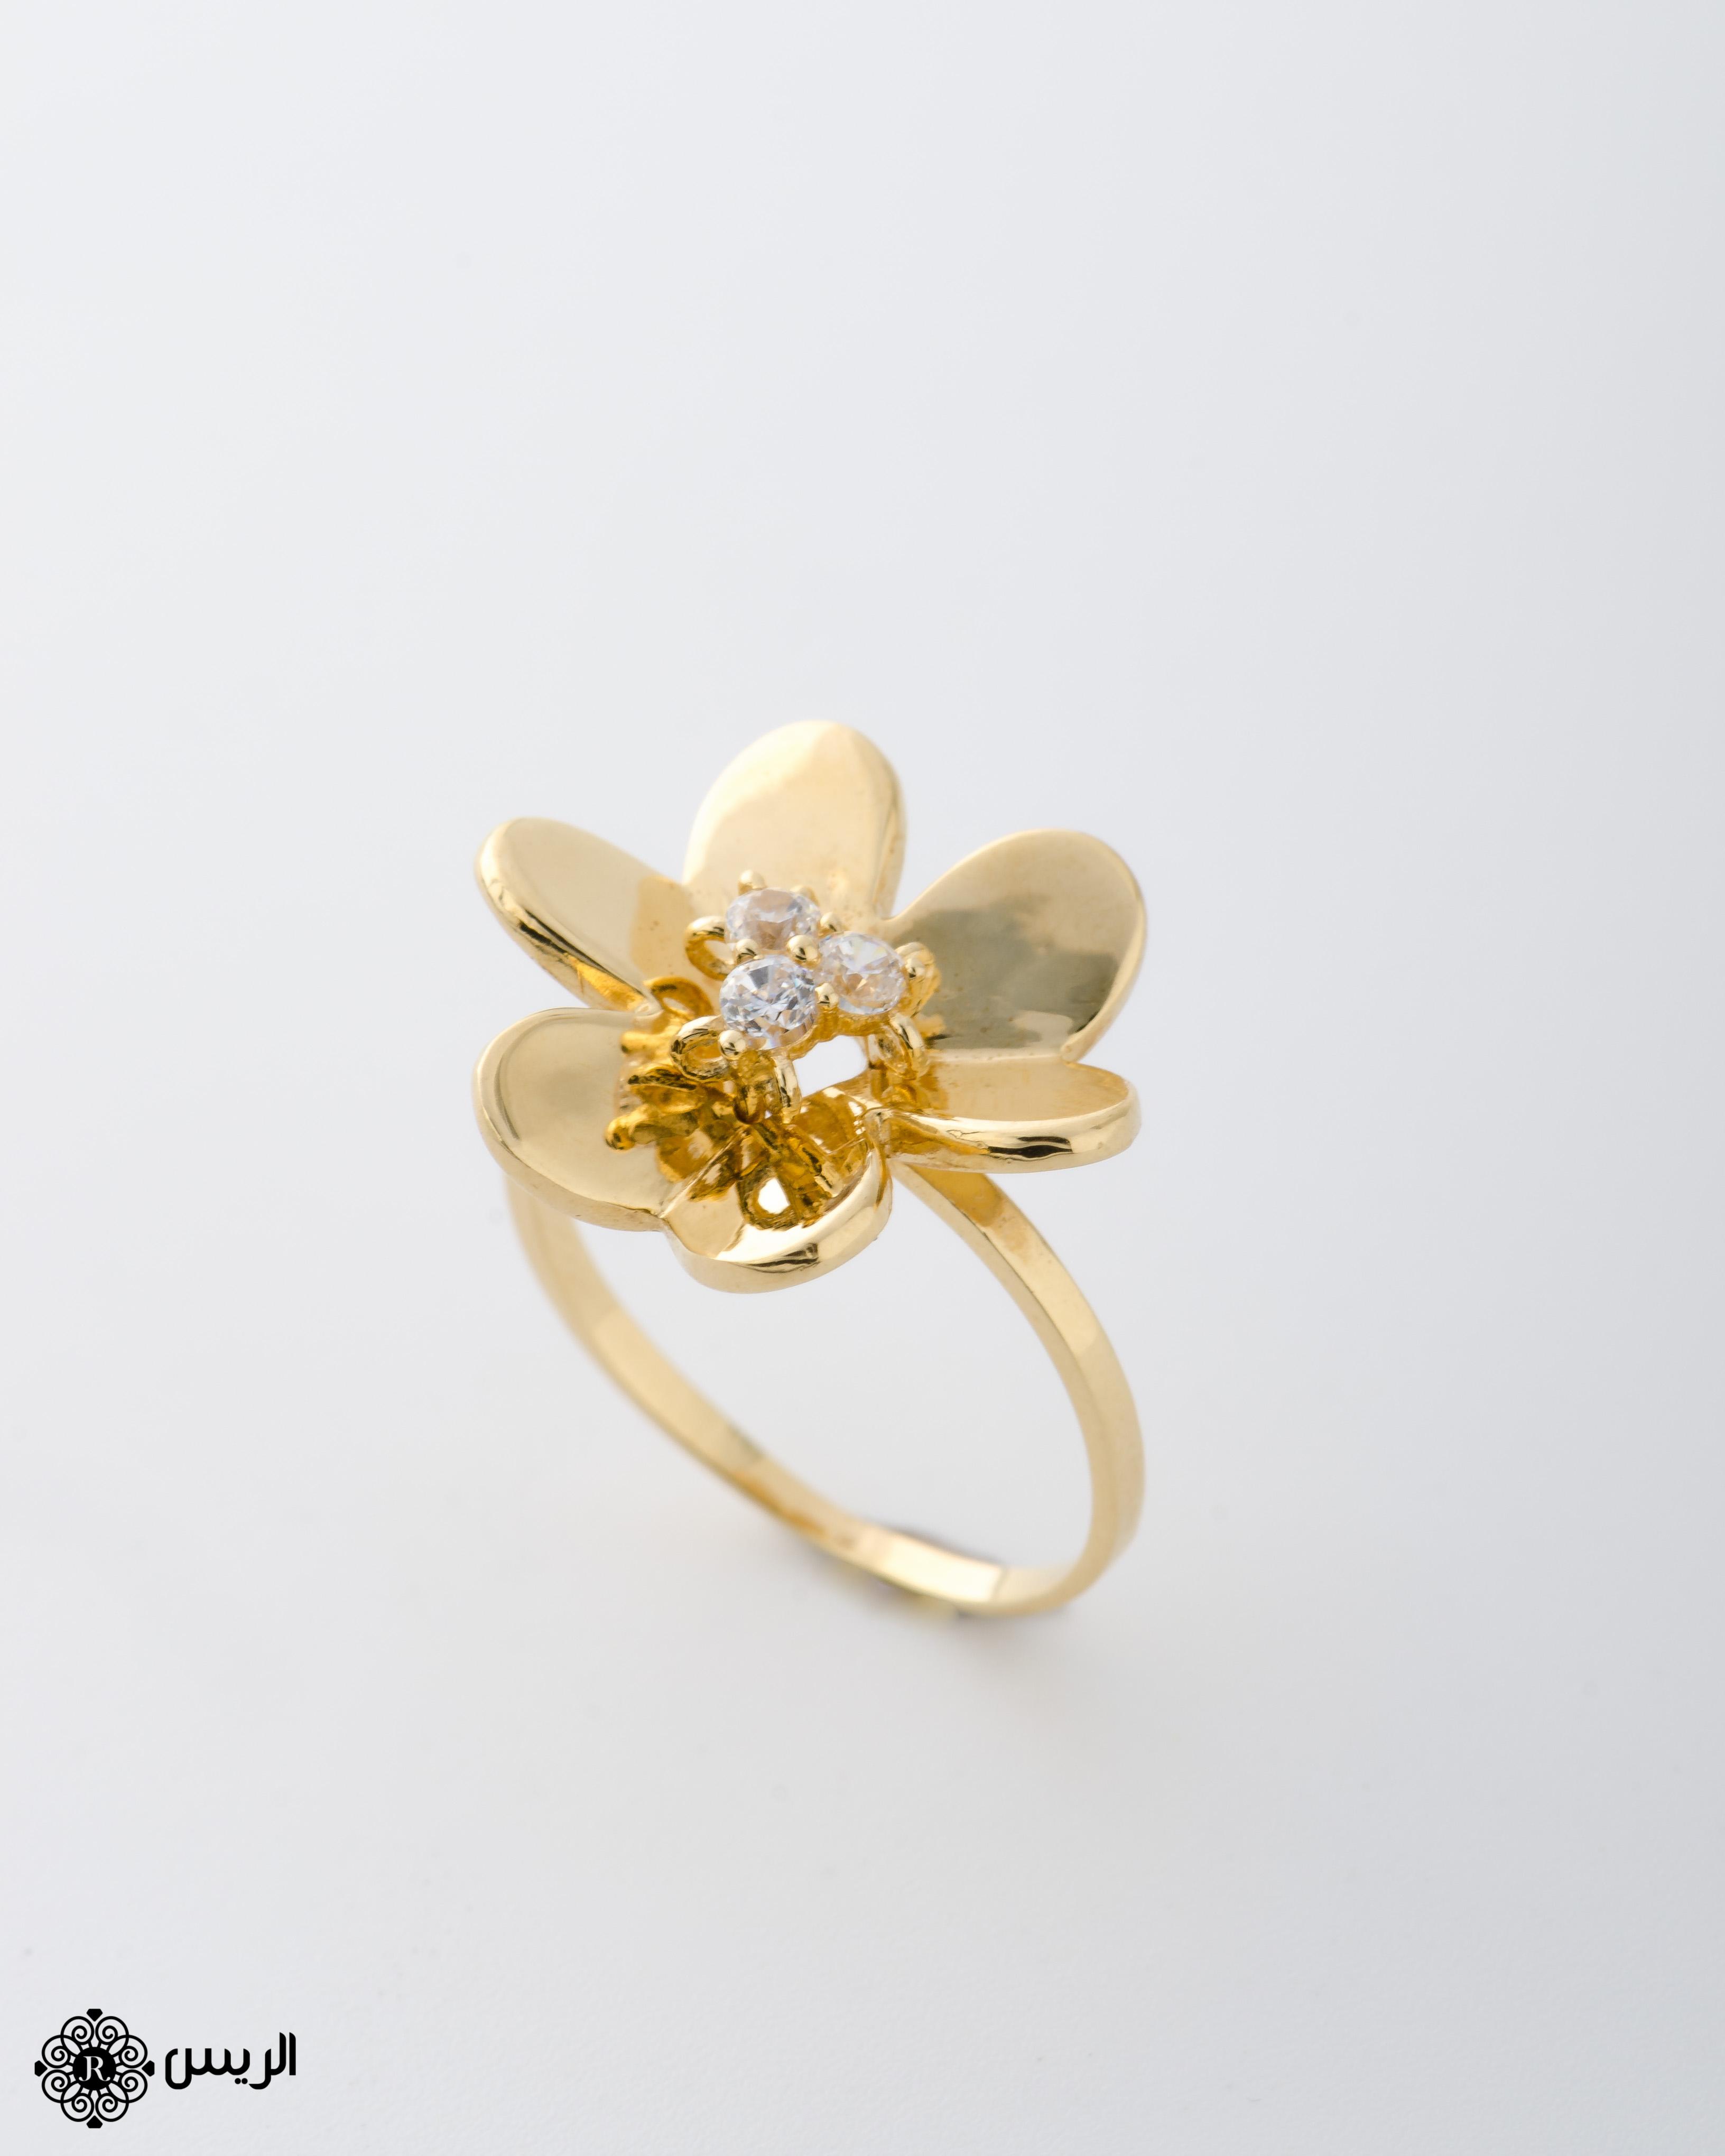 Raies jewelry Delicate Flower Ring خاتم ورده ناعم الريس للمجوهرات